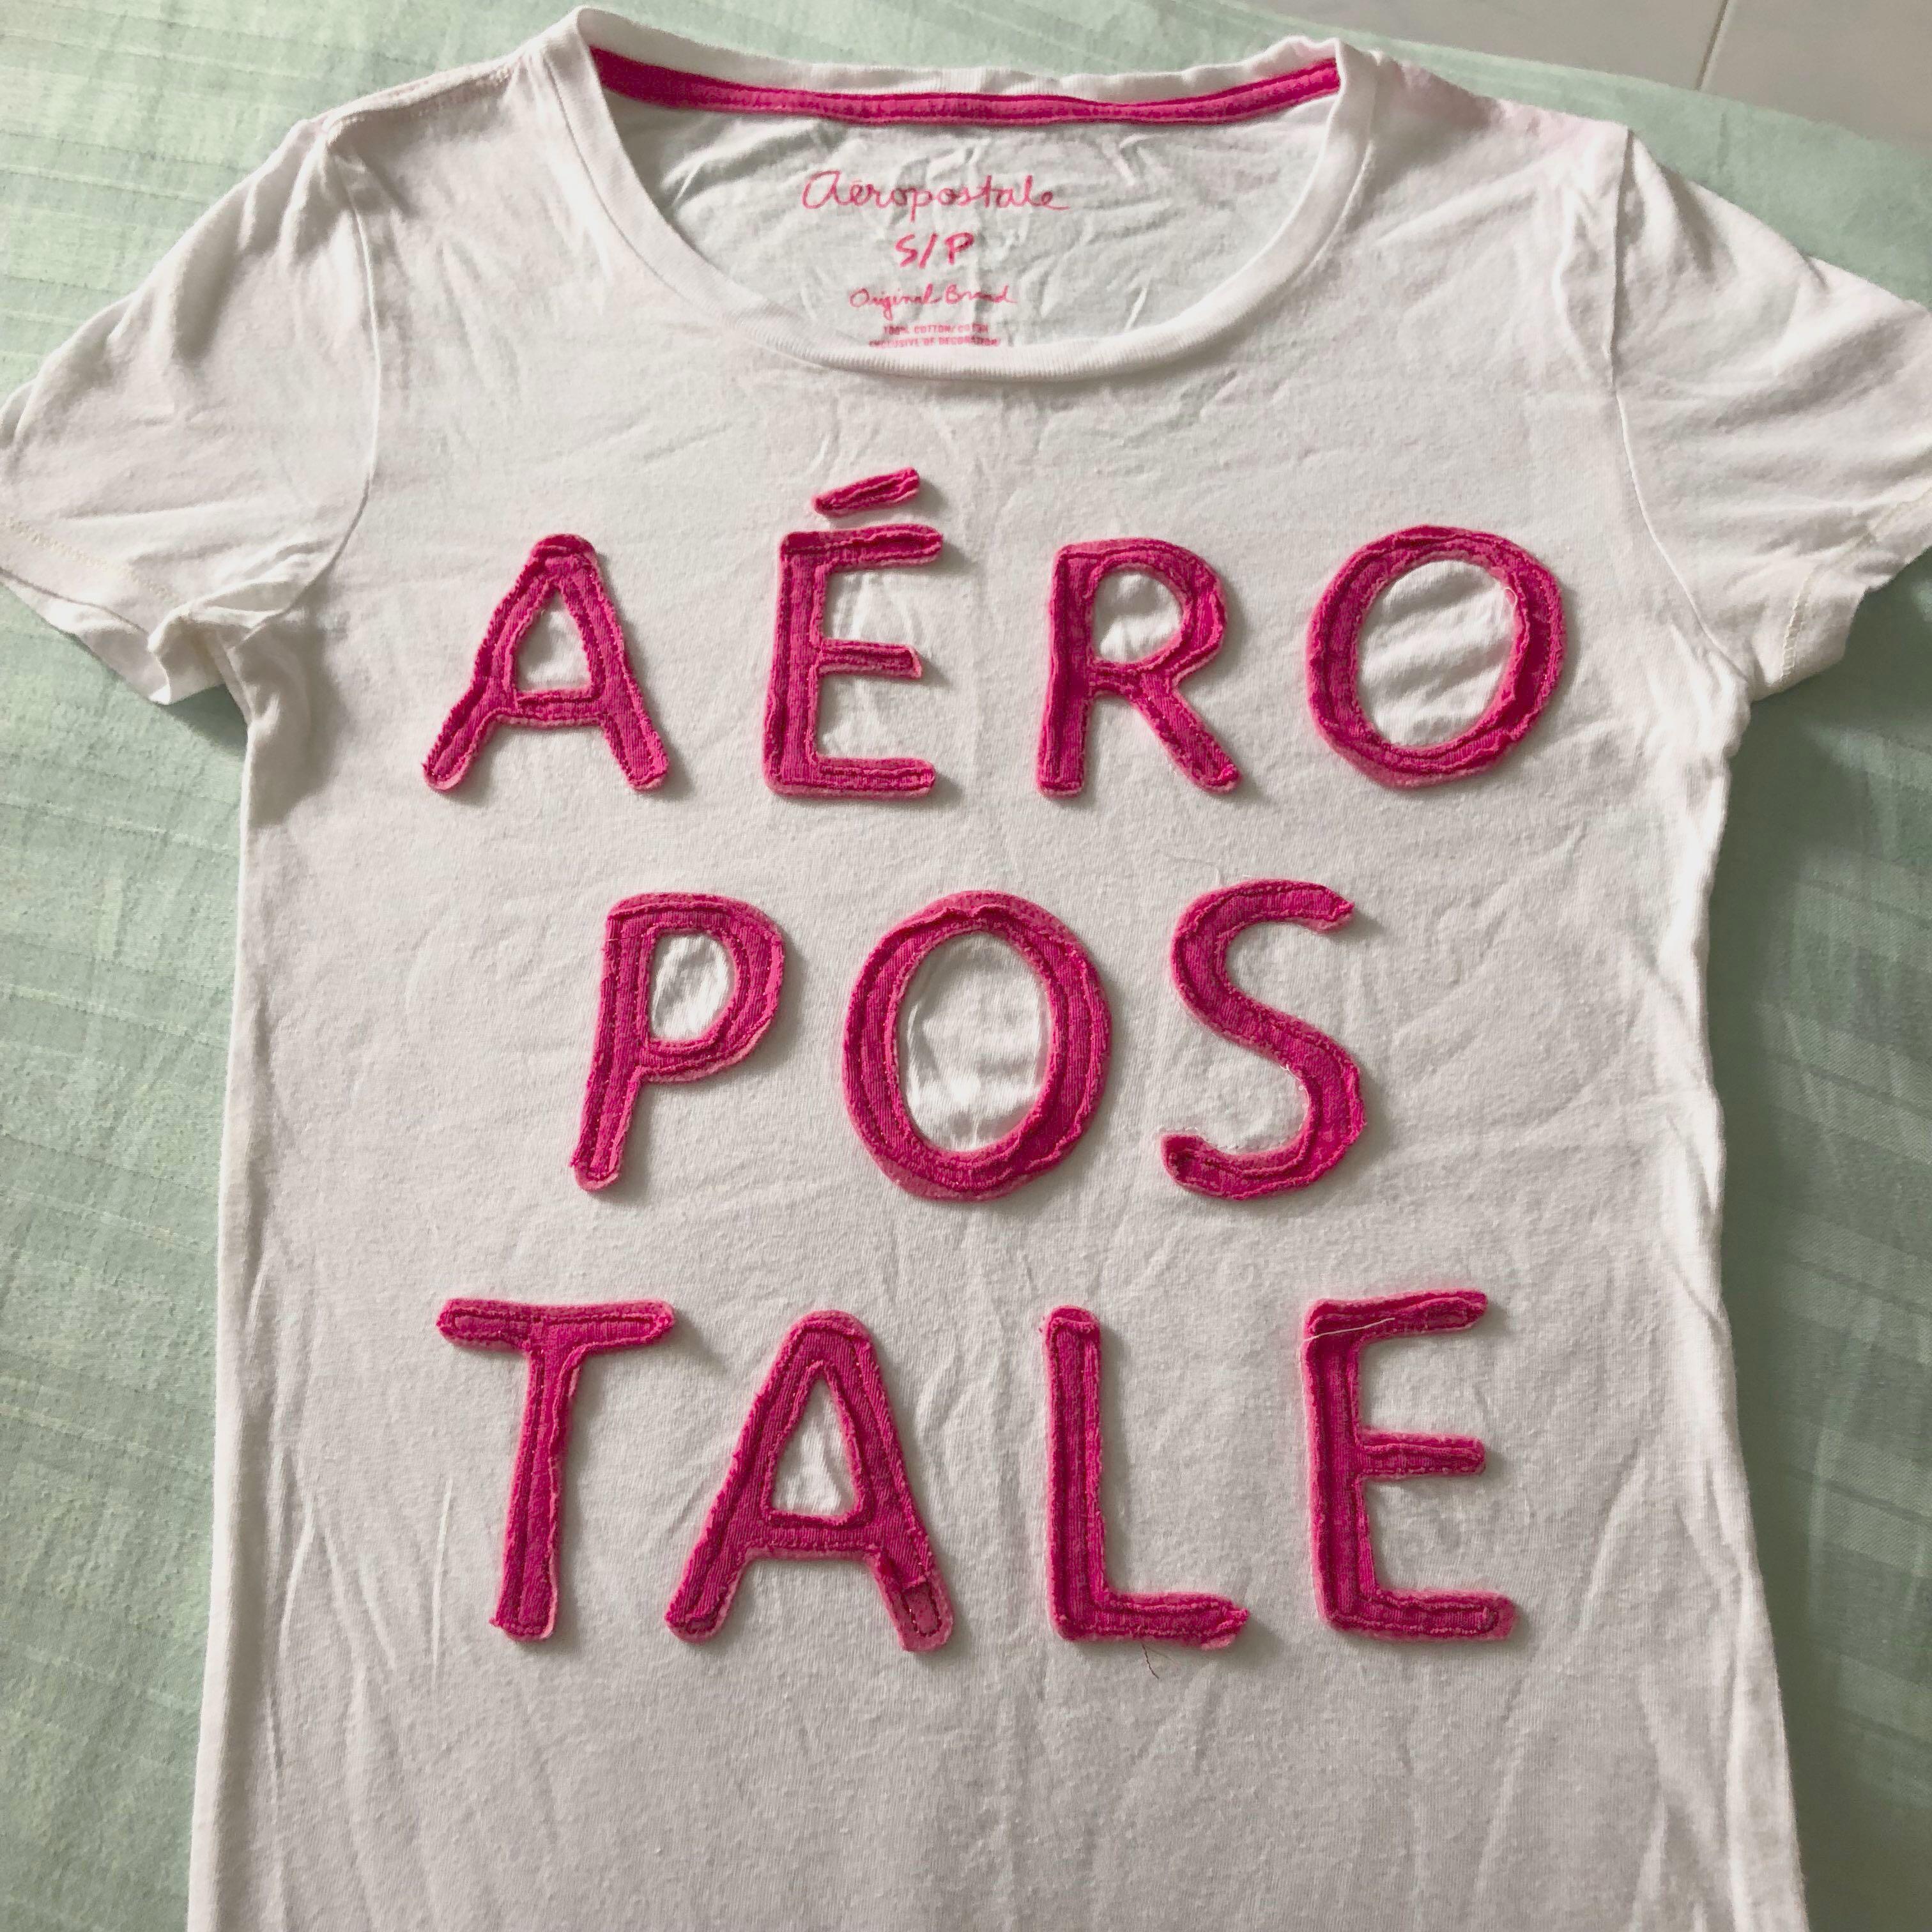 9e52fd32 Aeropostale Basic White T Shirt, Women's Fashion, Clothes, Tops on ...